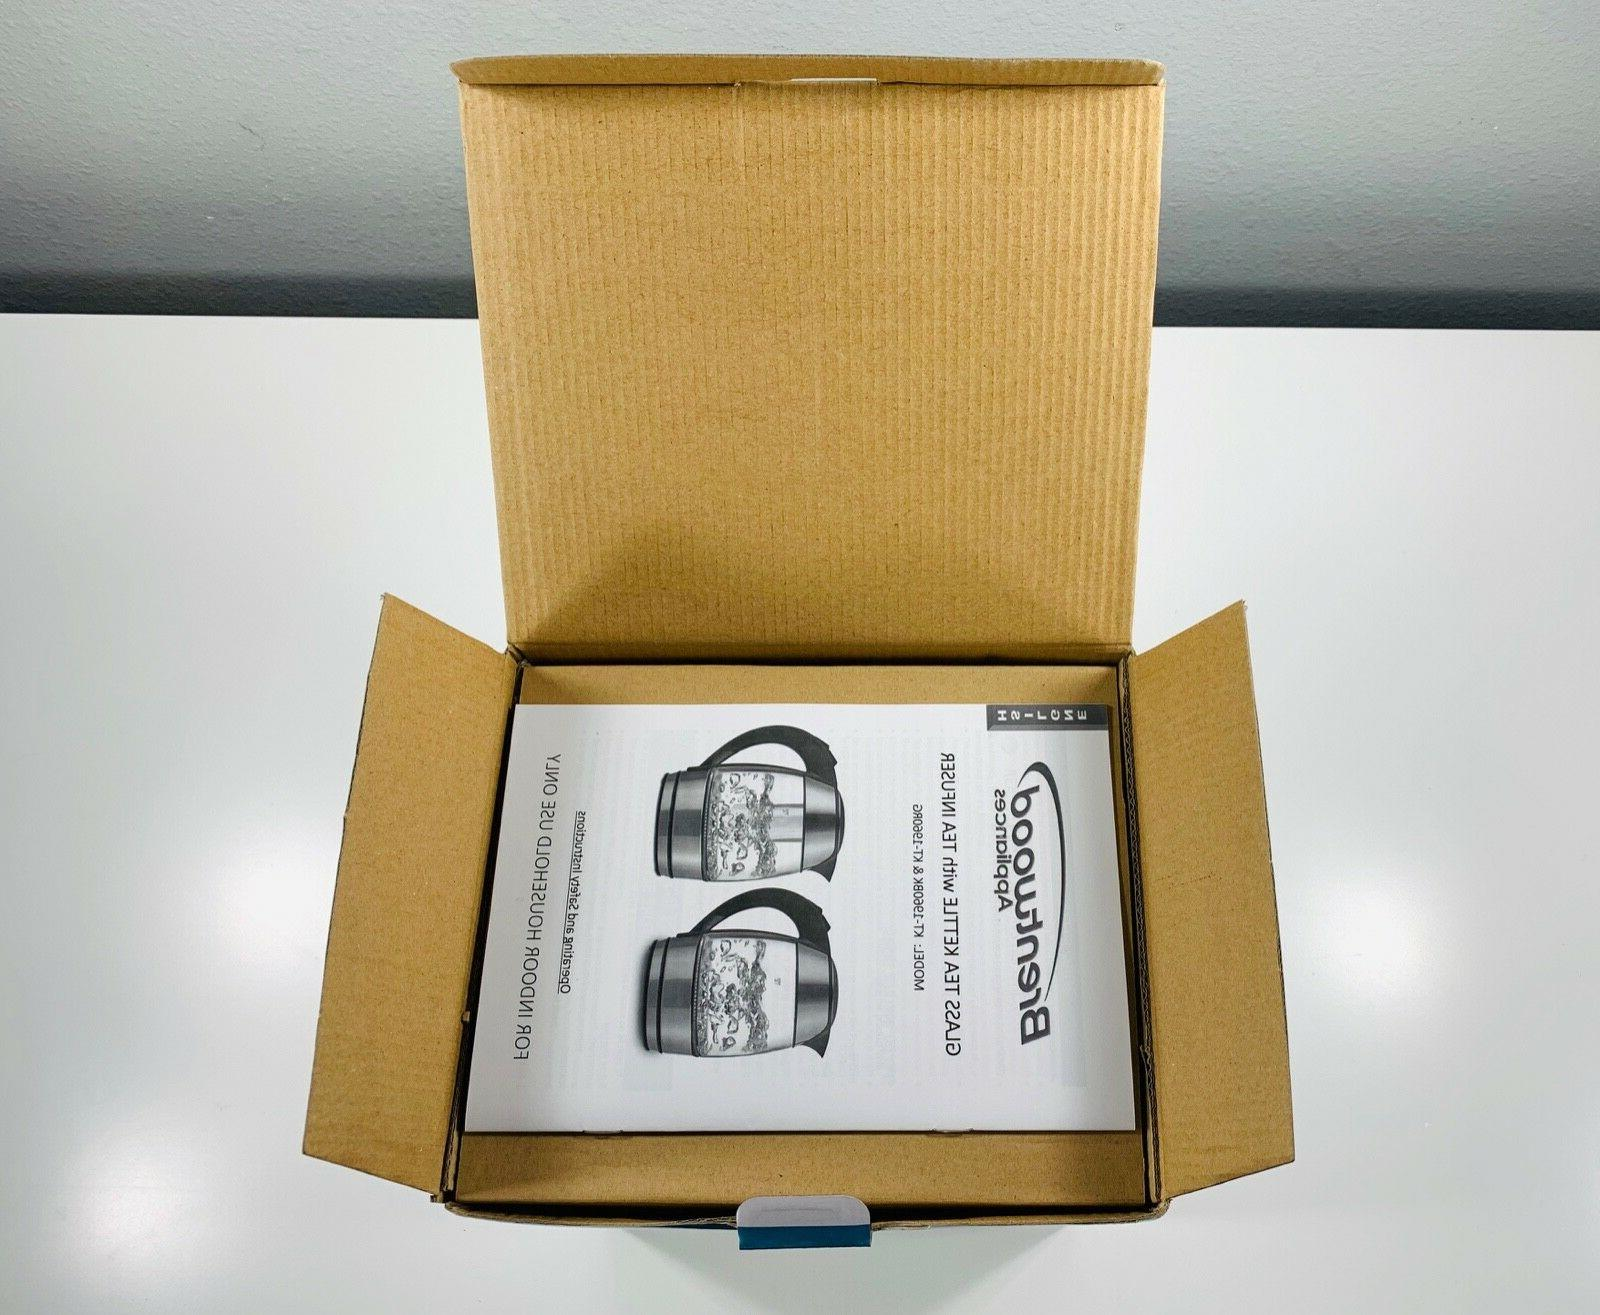 Brentwood Kettle W/Tea Infuser Black 1.8L/60oz Cordless